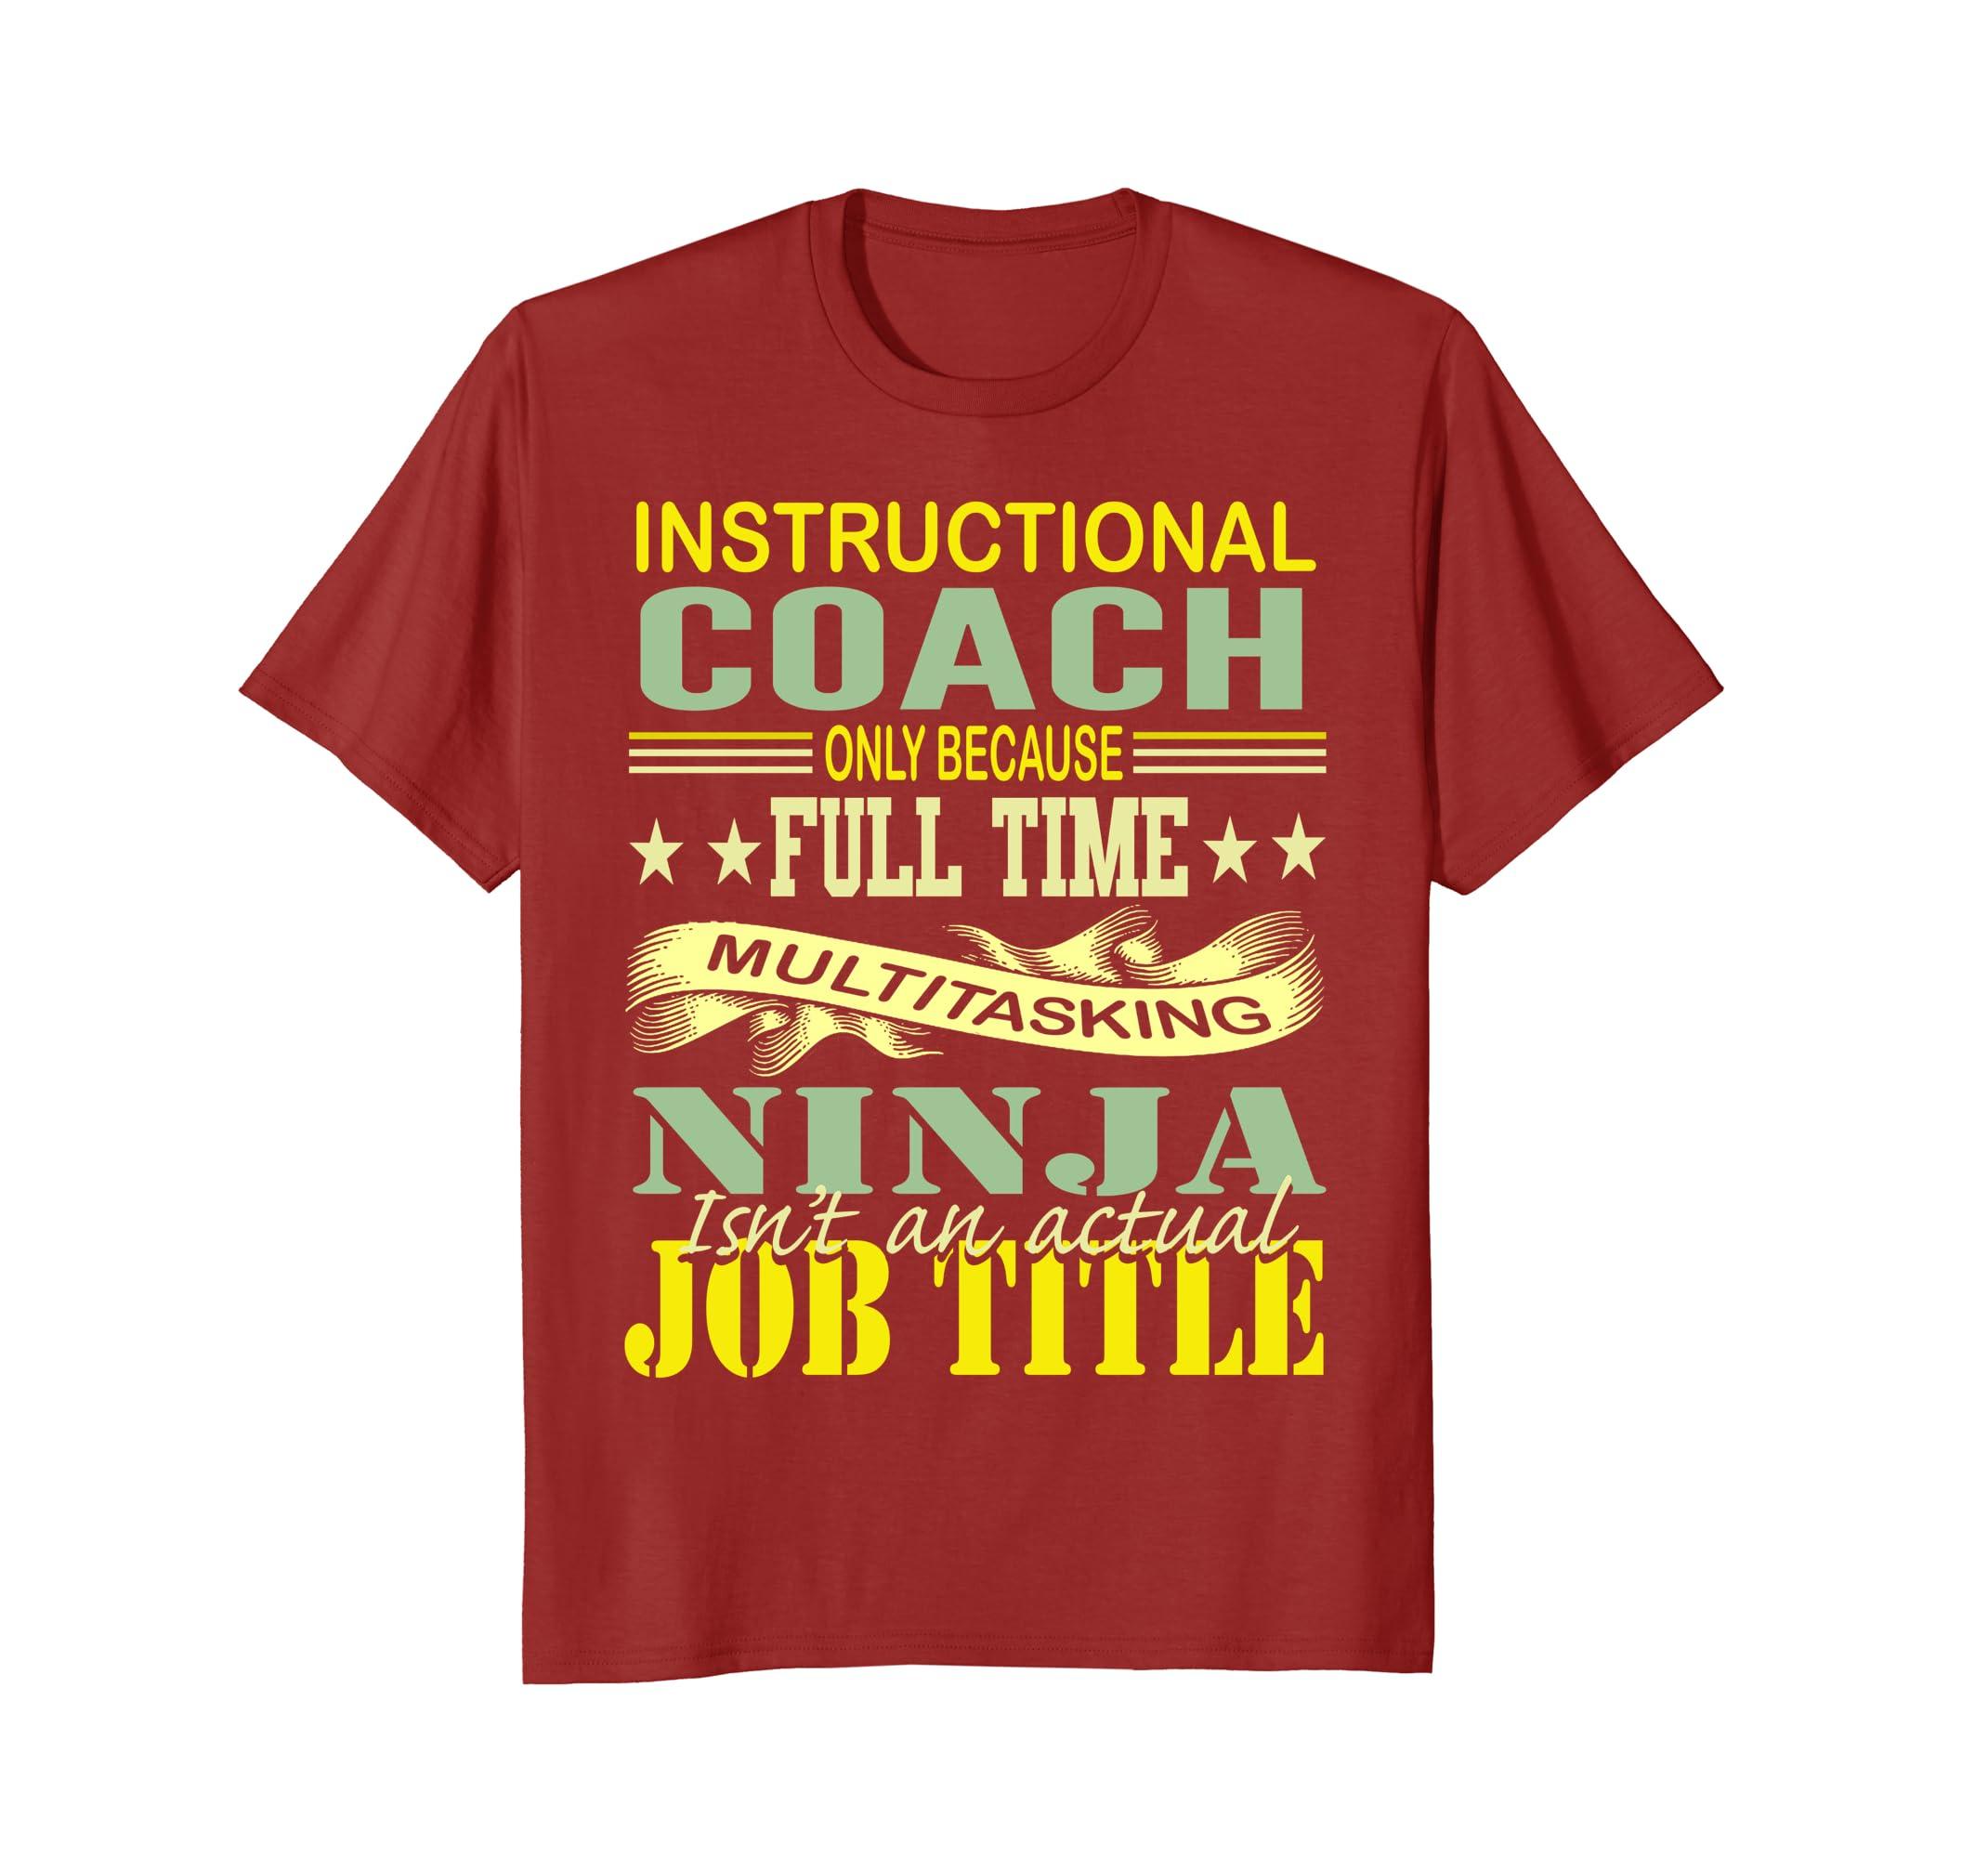 Amazon Instructional Coach Multitasking Ninja Job Title